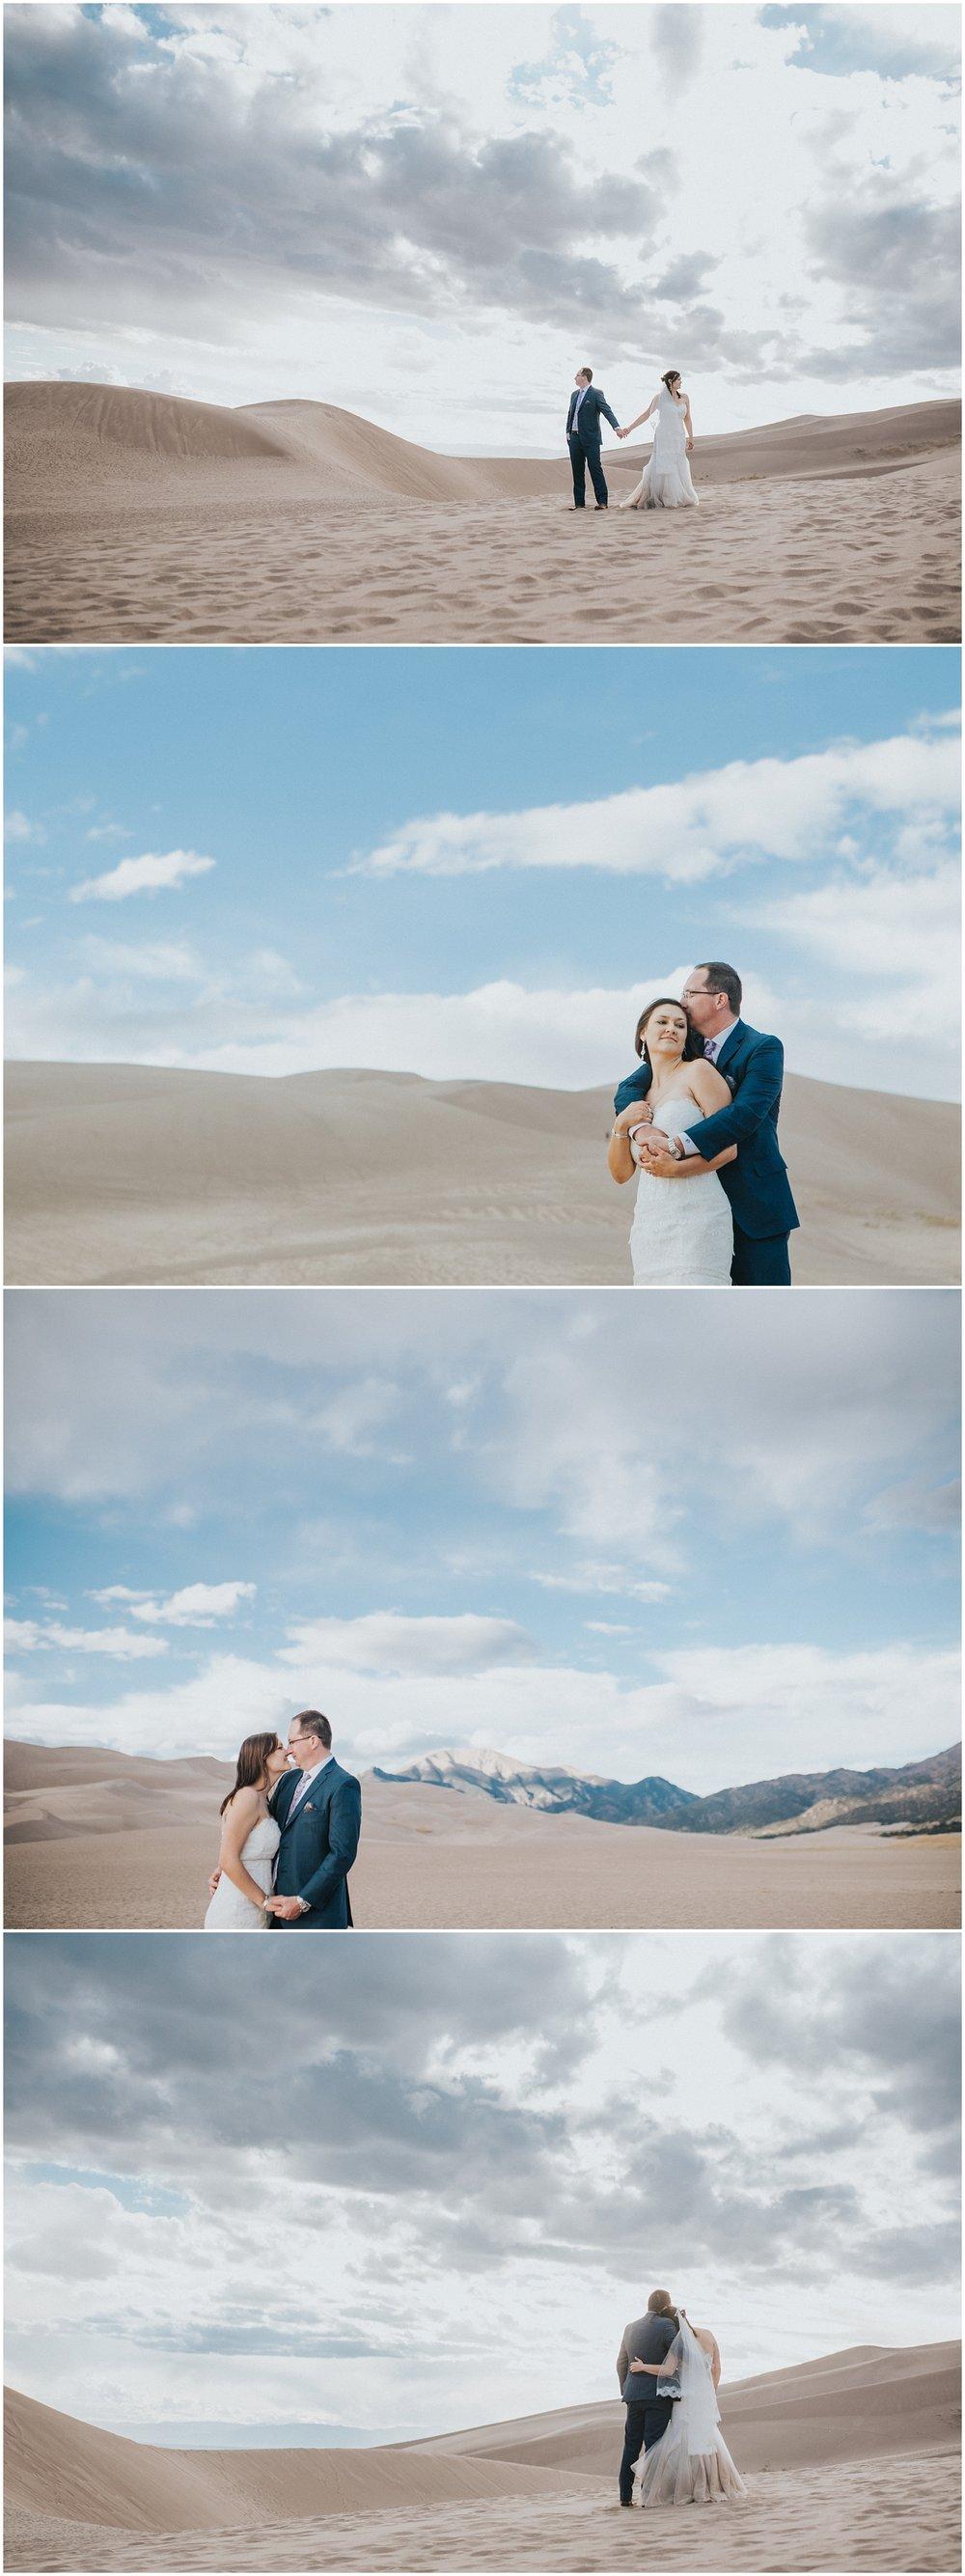 sand-dunes-national-park-wedding-photos_0017.jpg